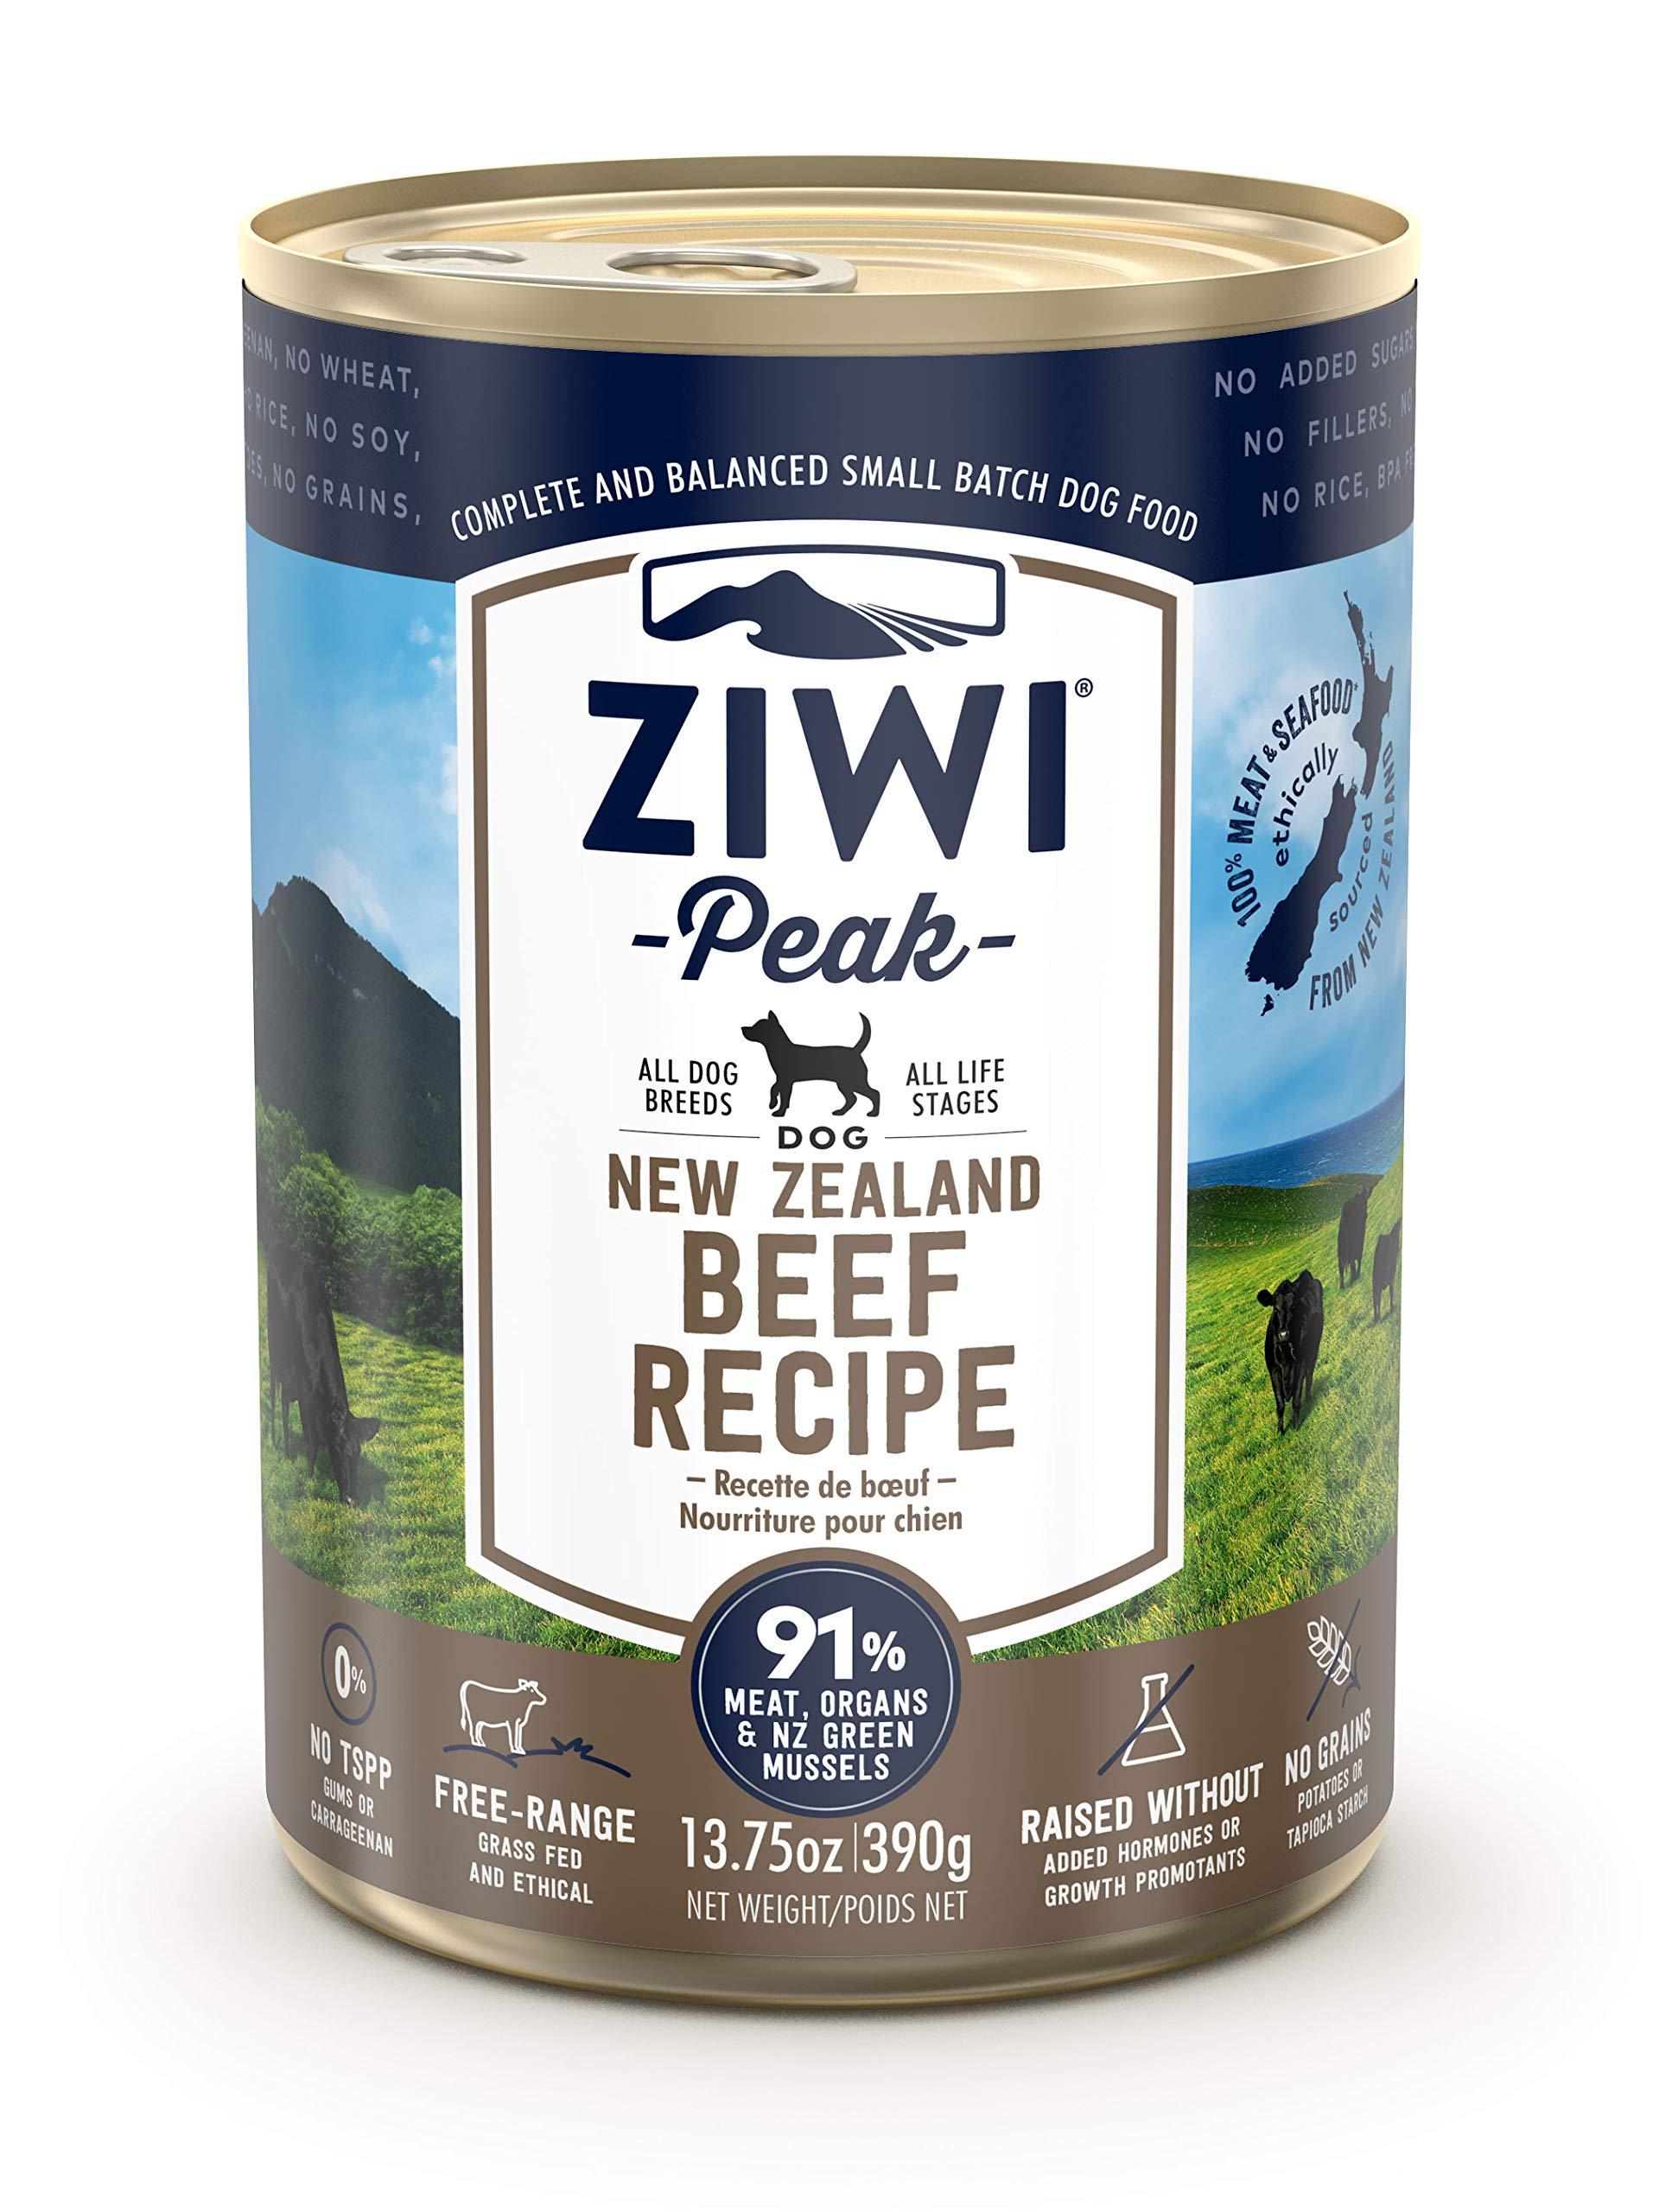 Ziwi Peak Canned Beef Recipe Dog Food (Case of 12, 13.75 oz. each) by Ziwi Peak